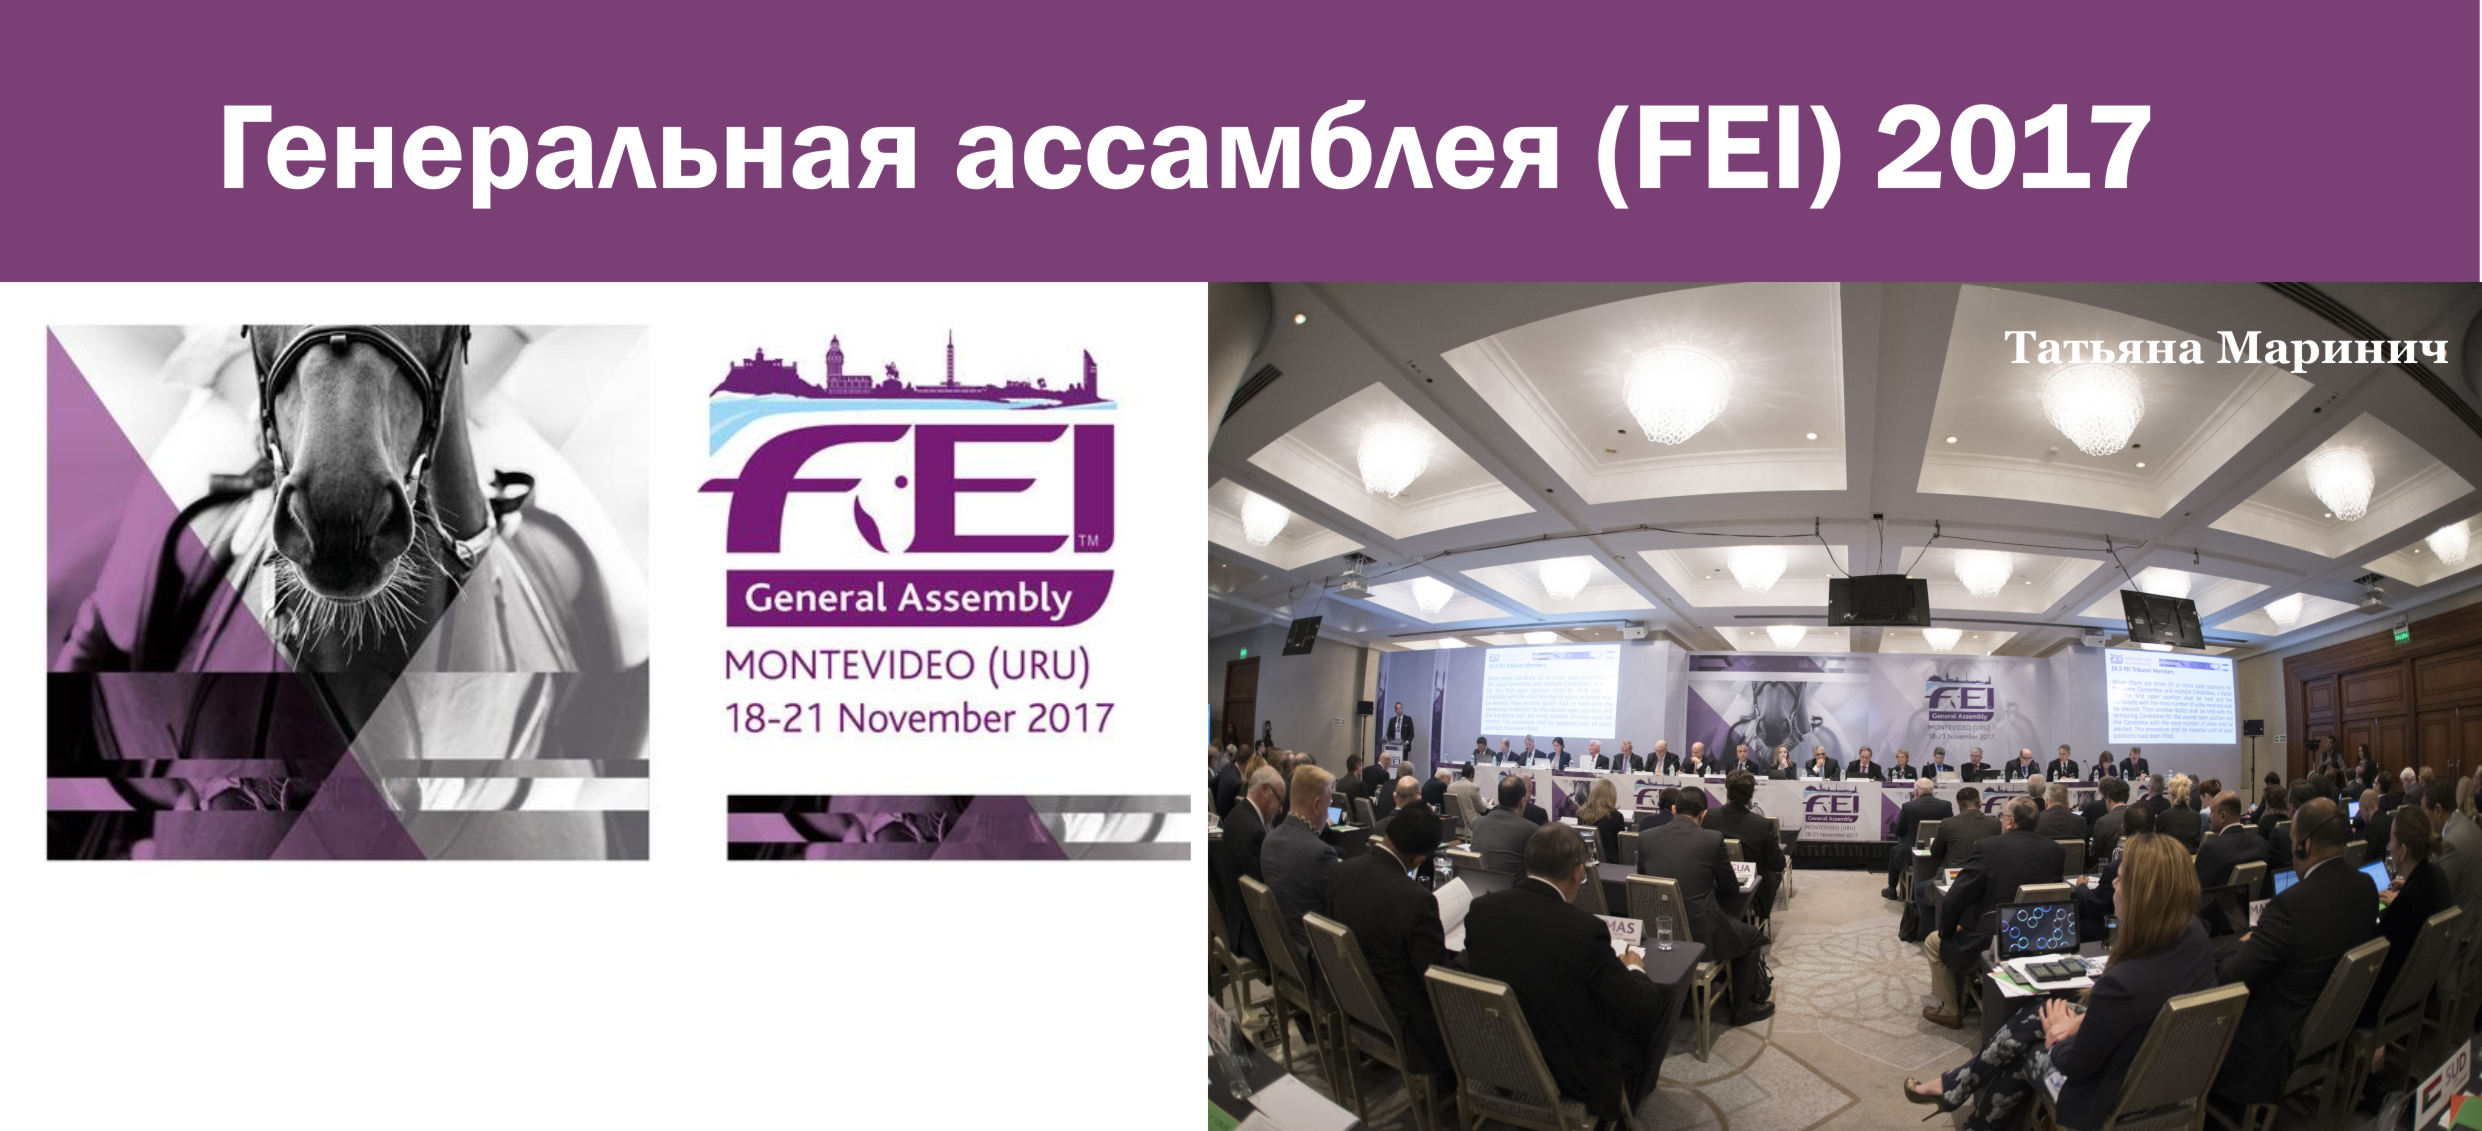 Генеральная ассамблея (FEI) 2017 (выпуск журнала №39)